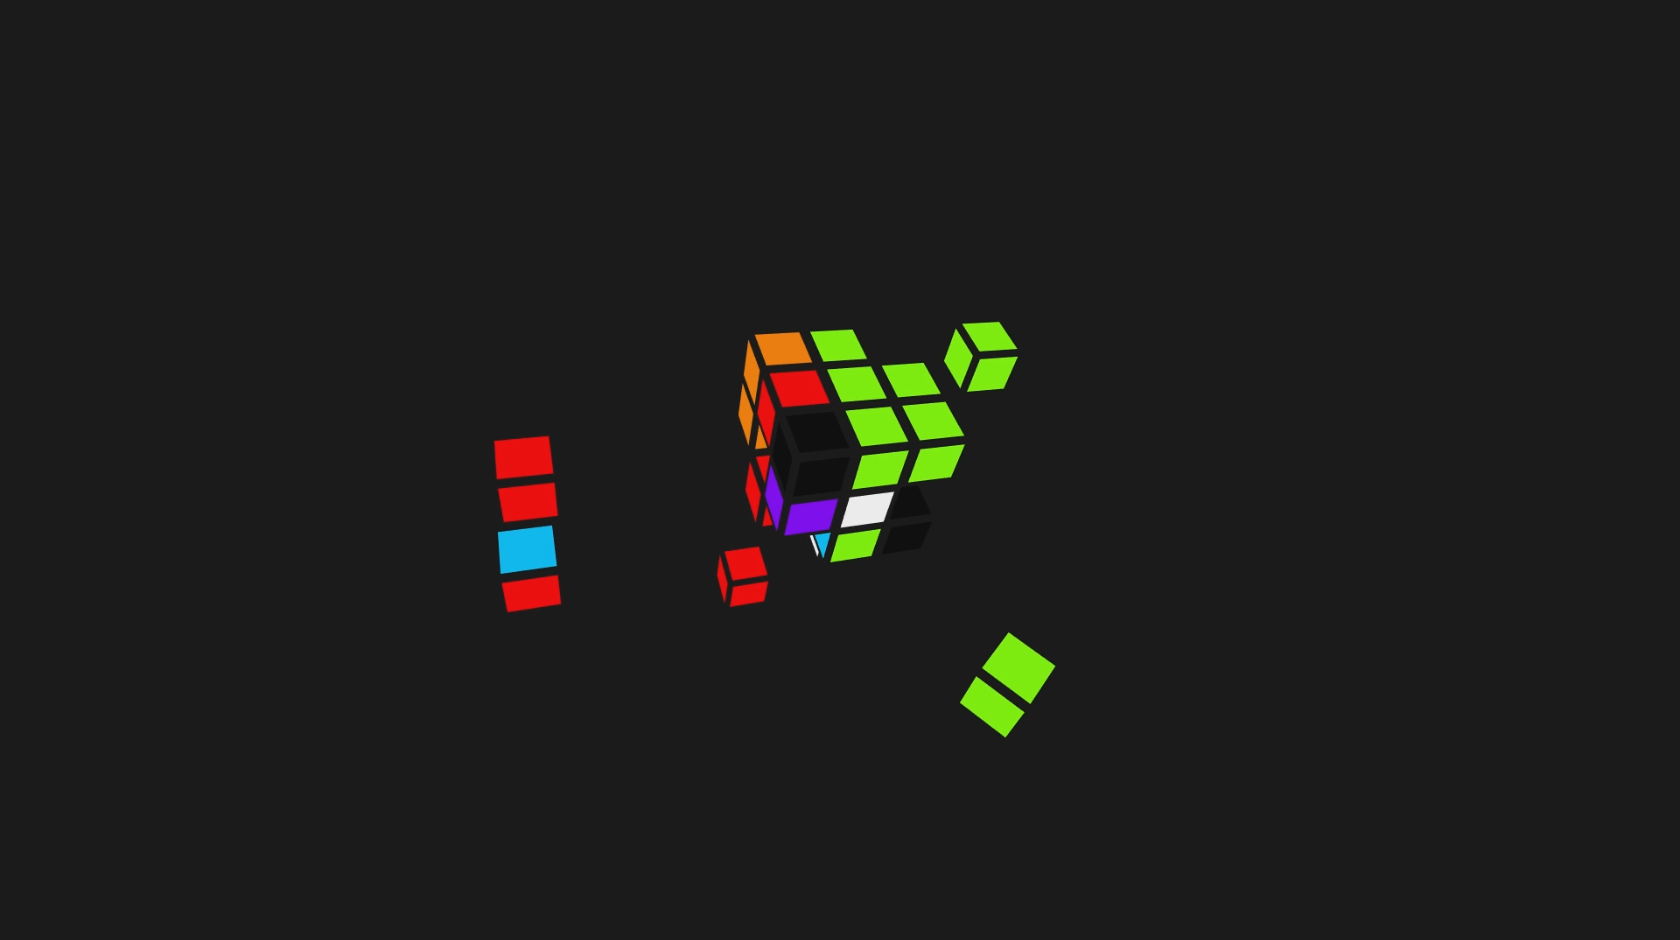 screenshot-hexahedroniks-01.png